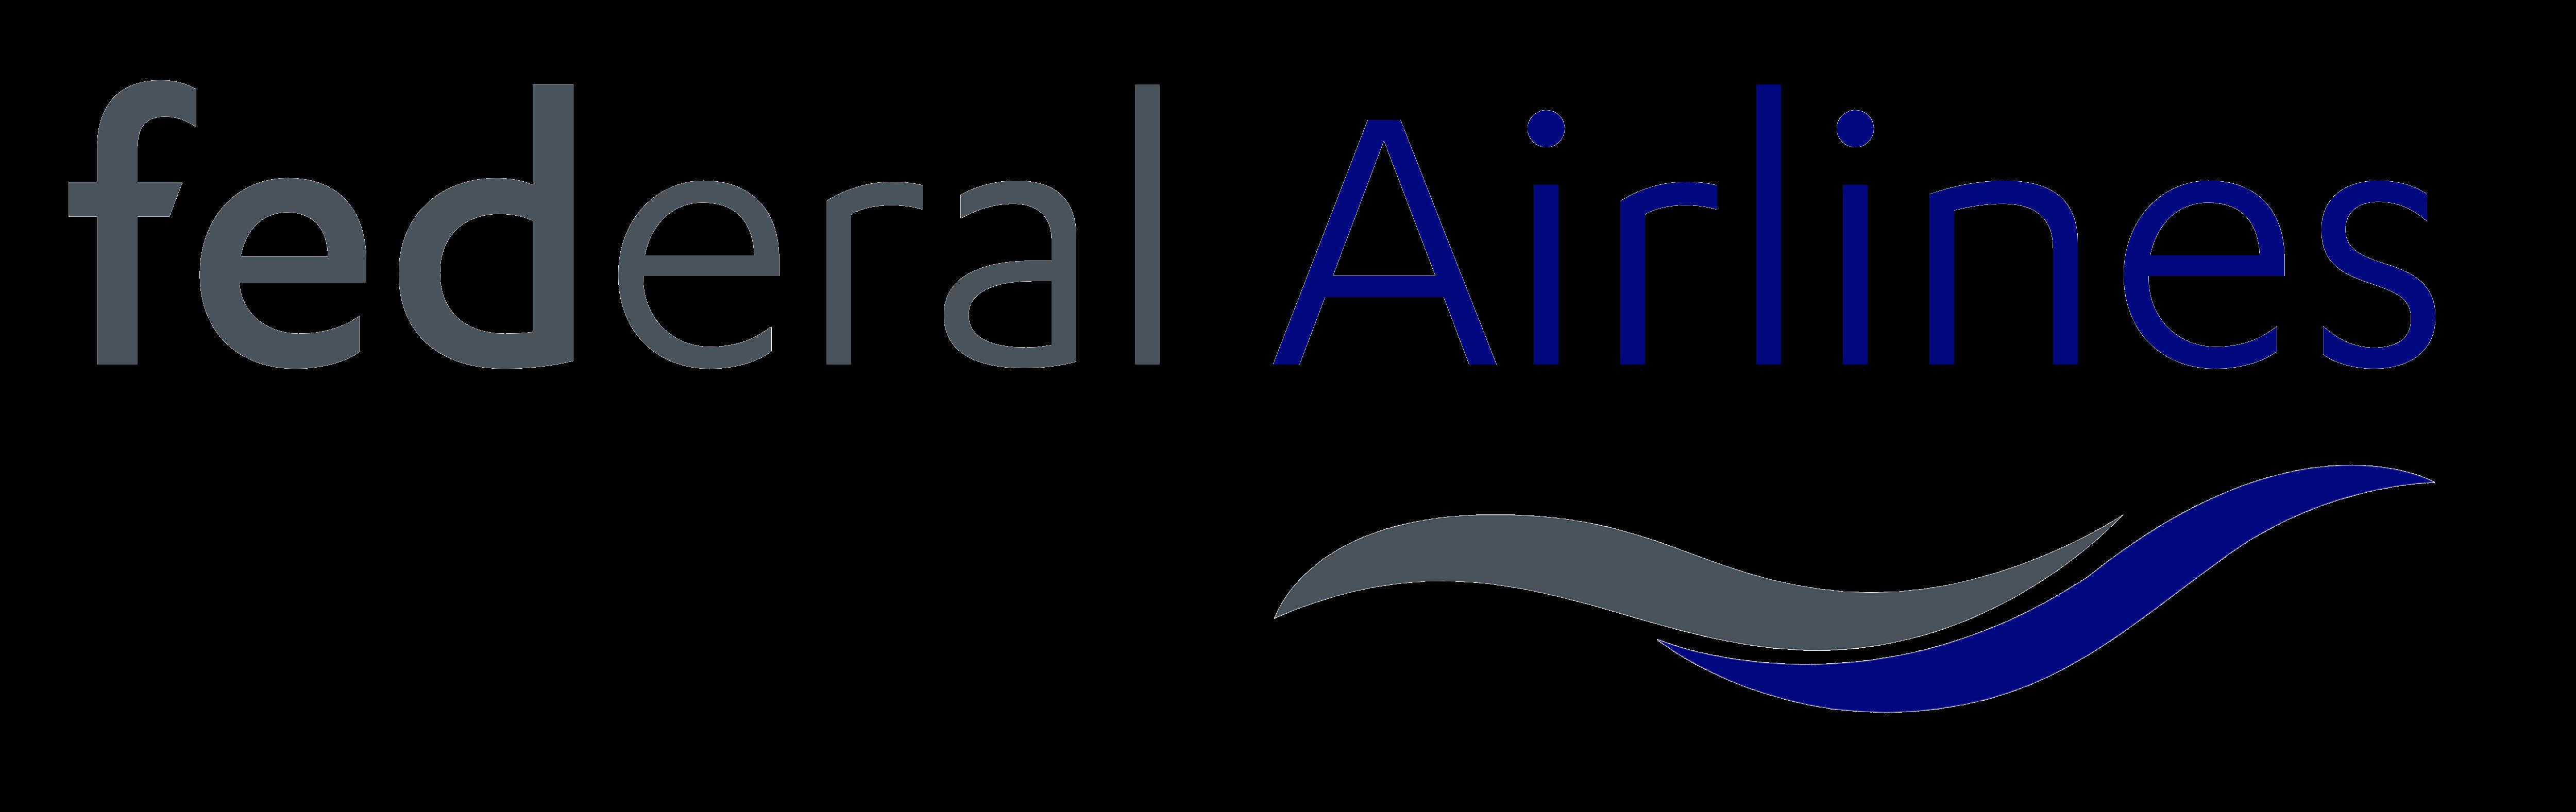 https://storage.aerocrs.com/206/system/transparent-logo.png